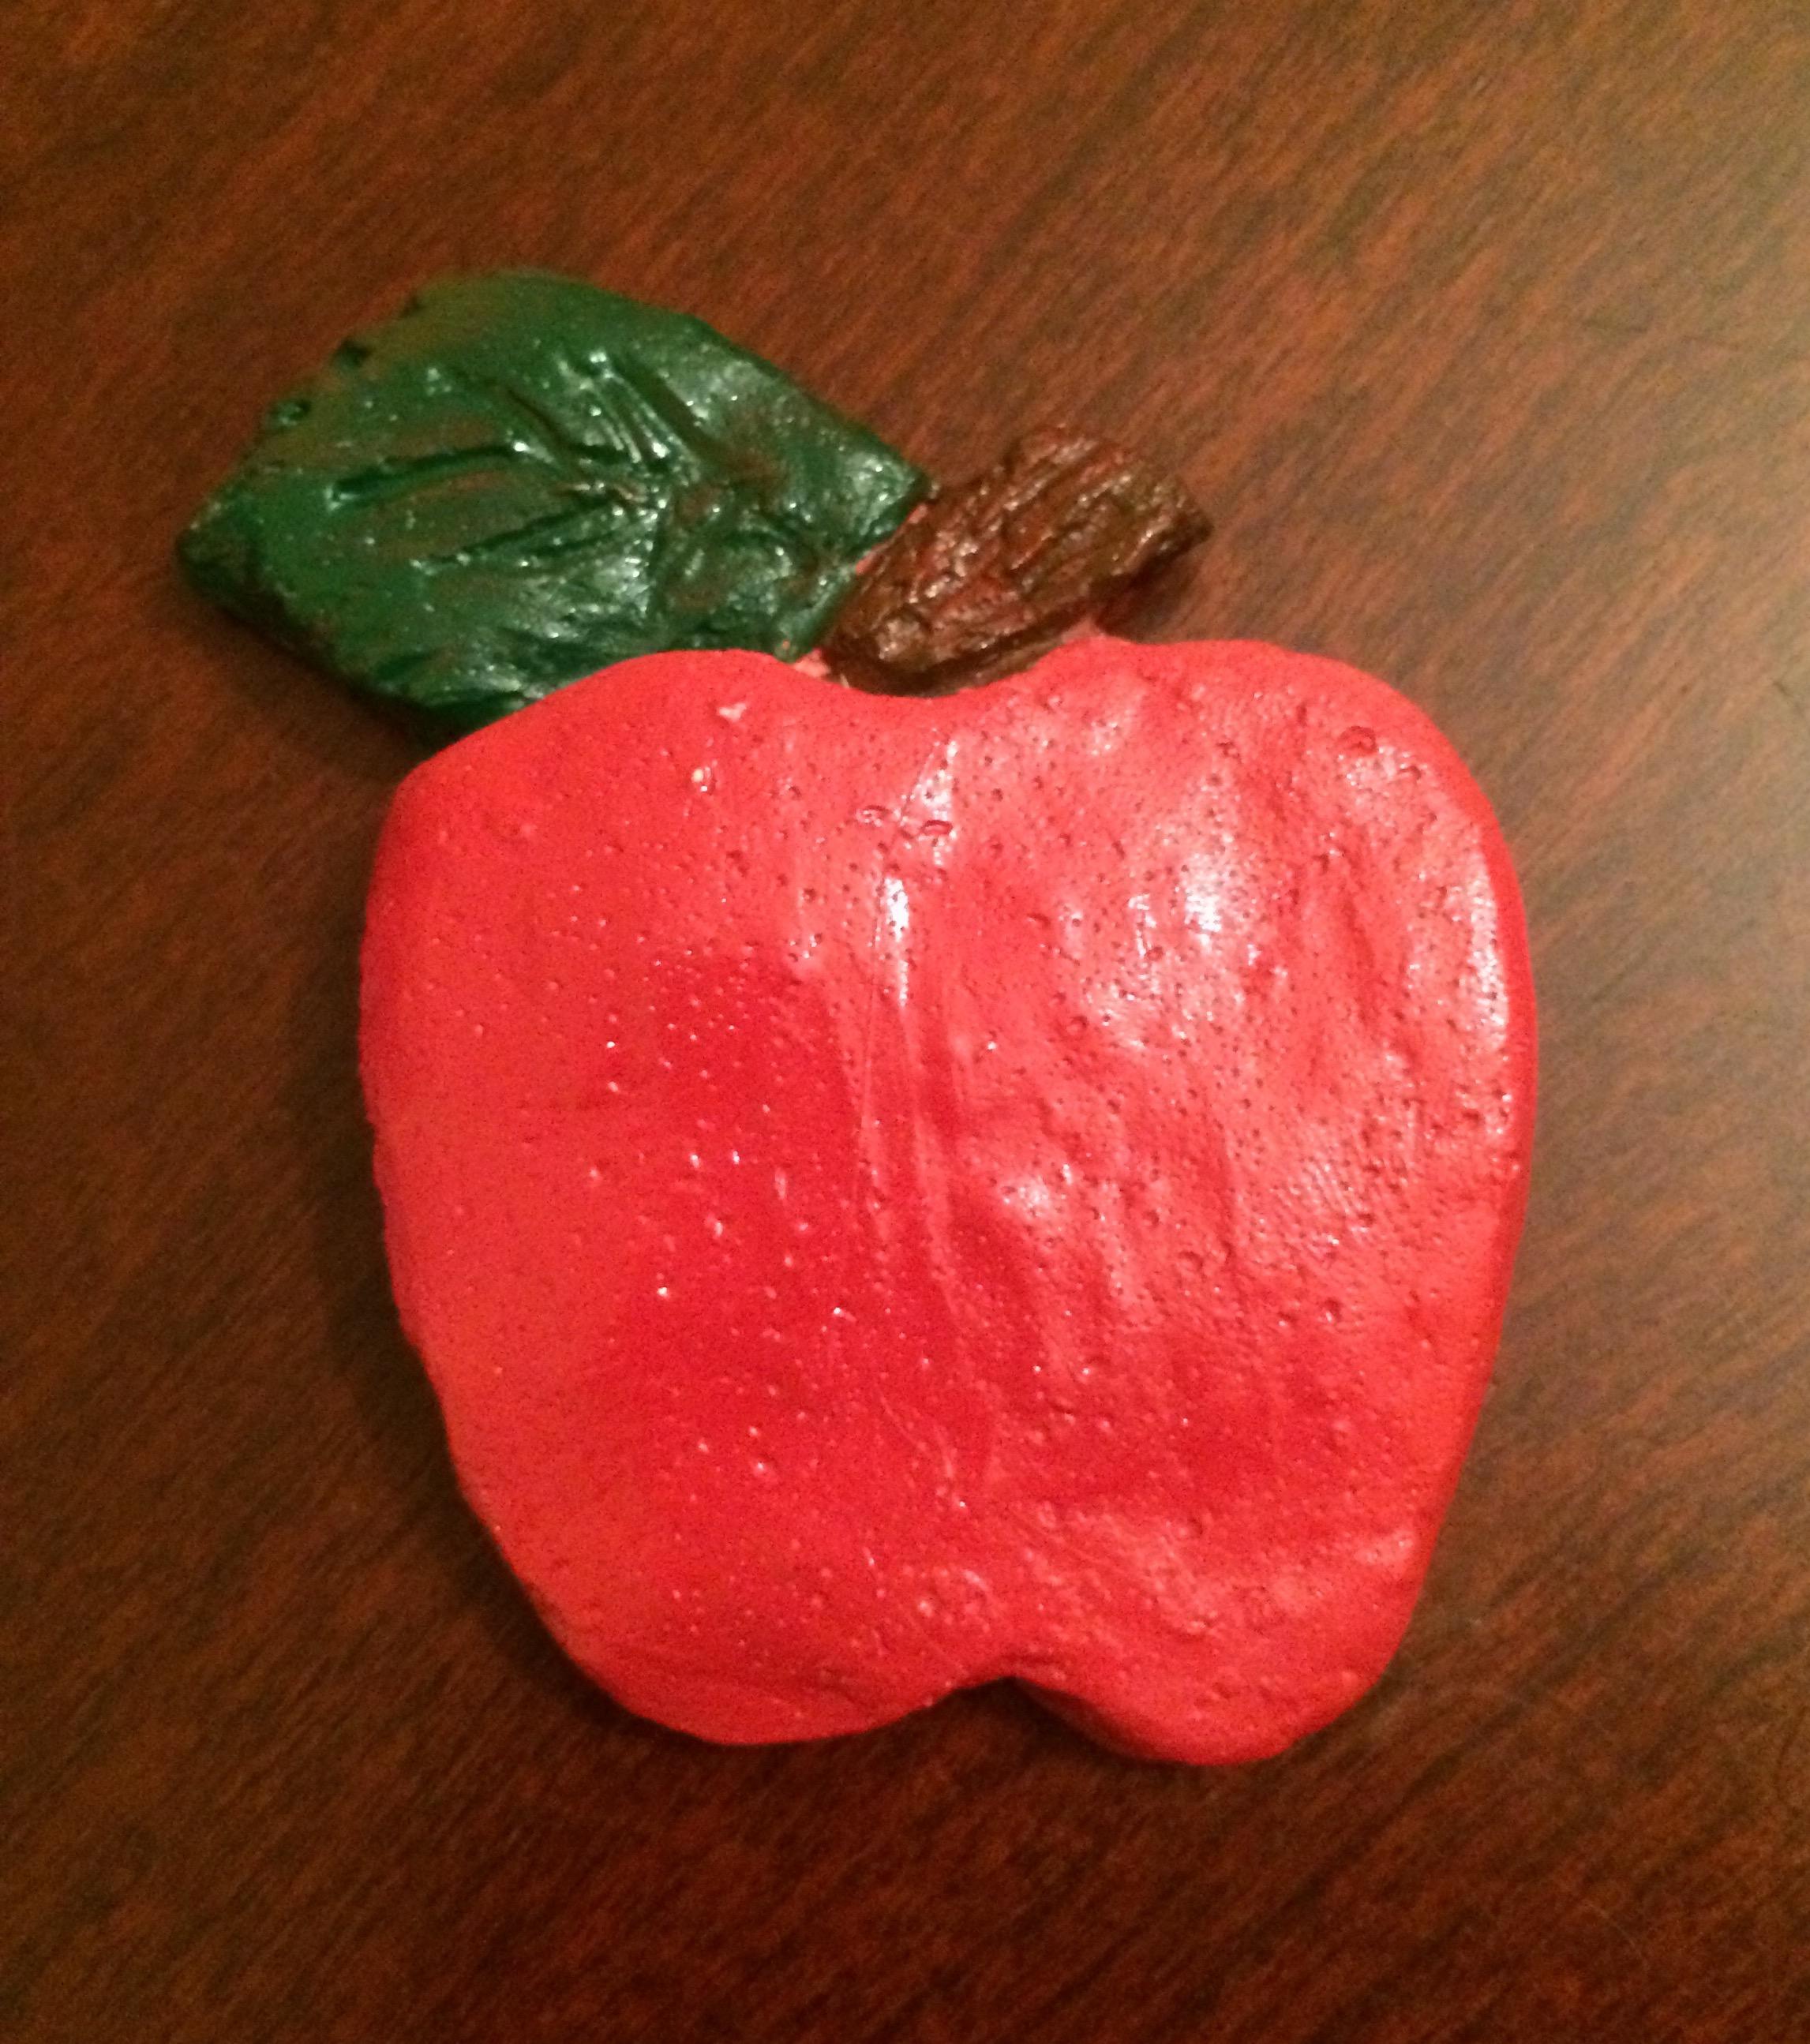 AppleMagnet